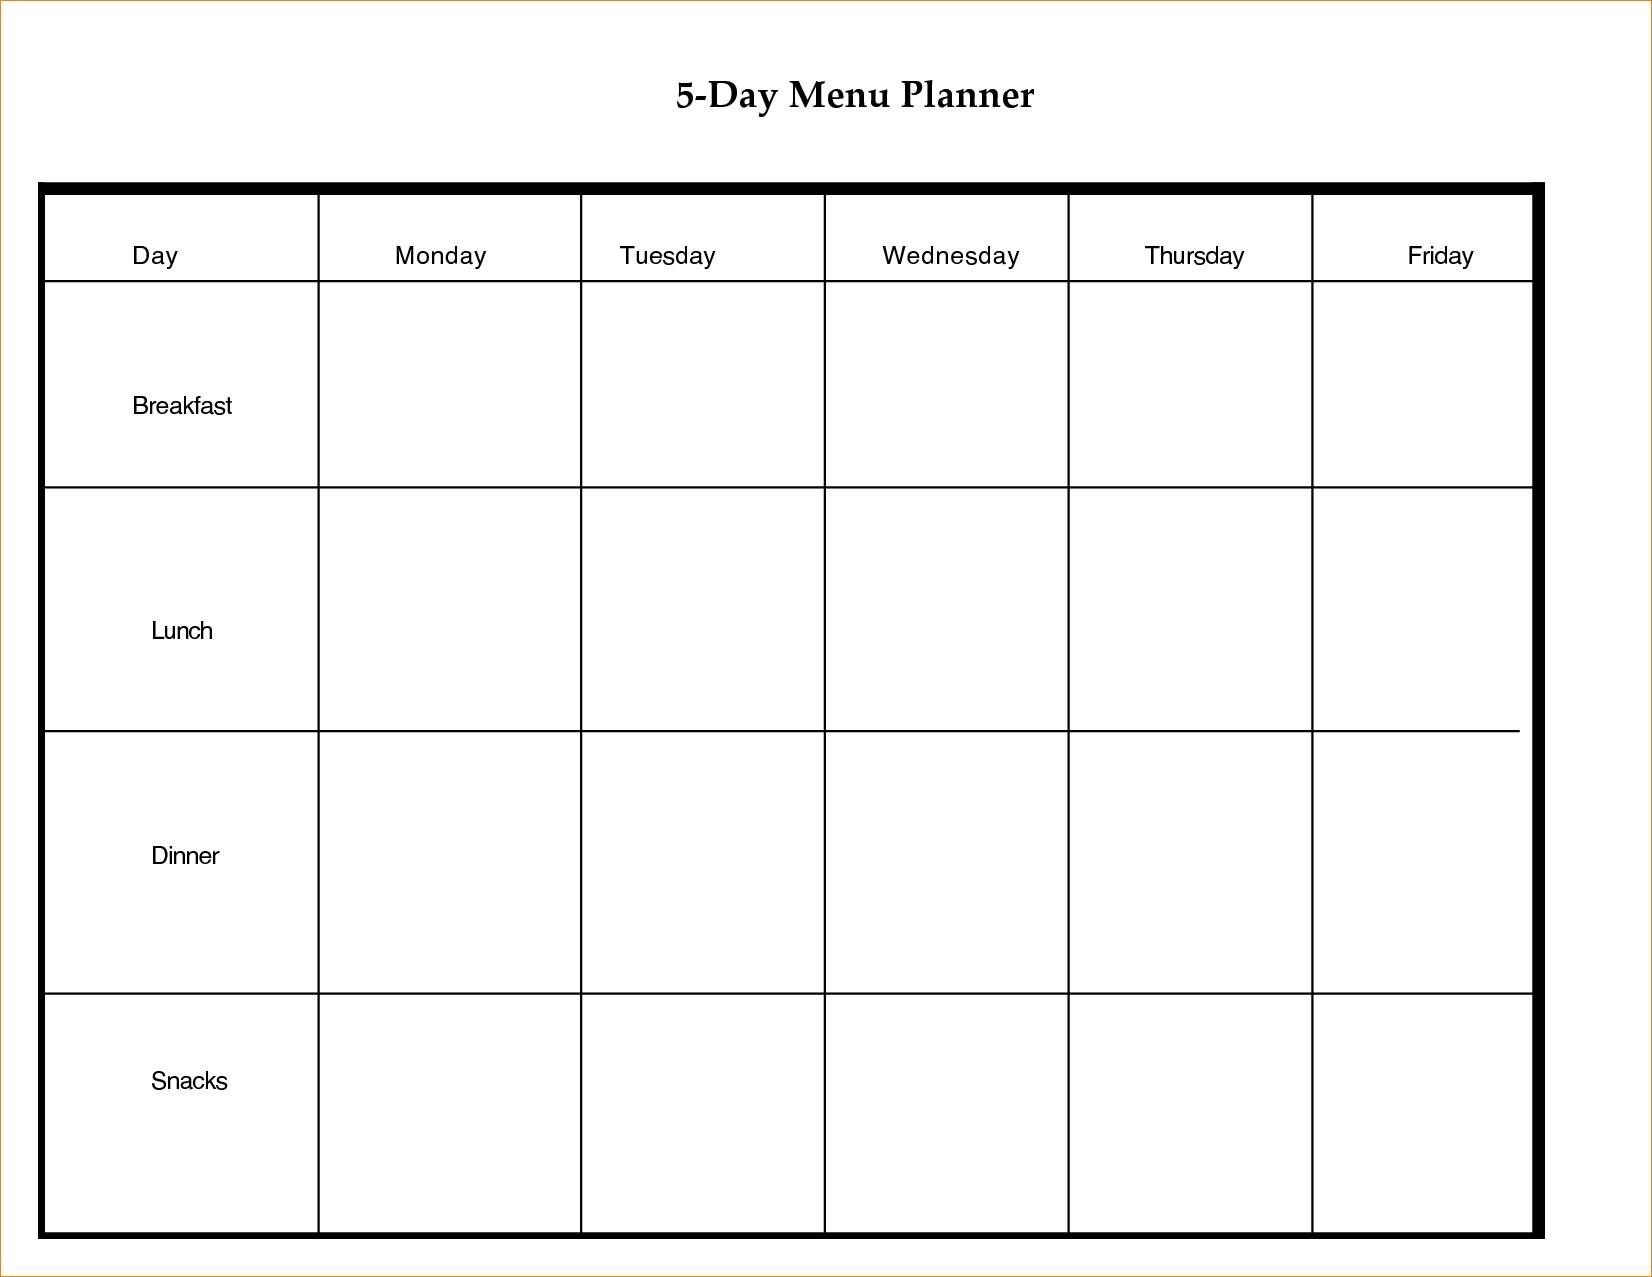 Printable 5 Day Calendar Blank Calendar Template 5 Day Week 0 8 With for Printable Blank Weekly Calendars Templates